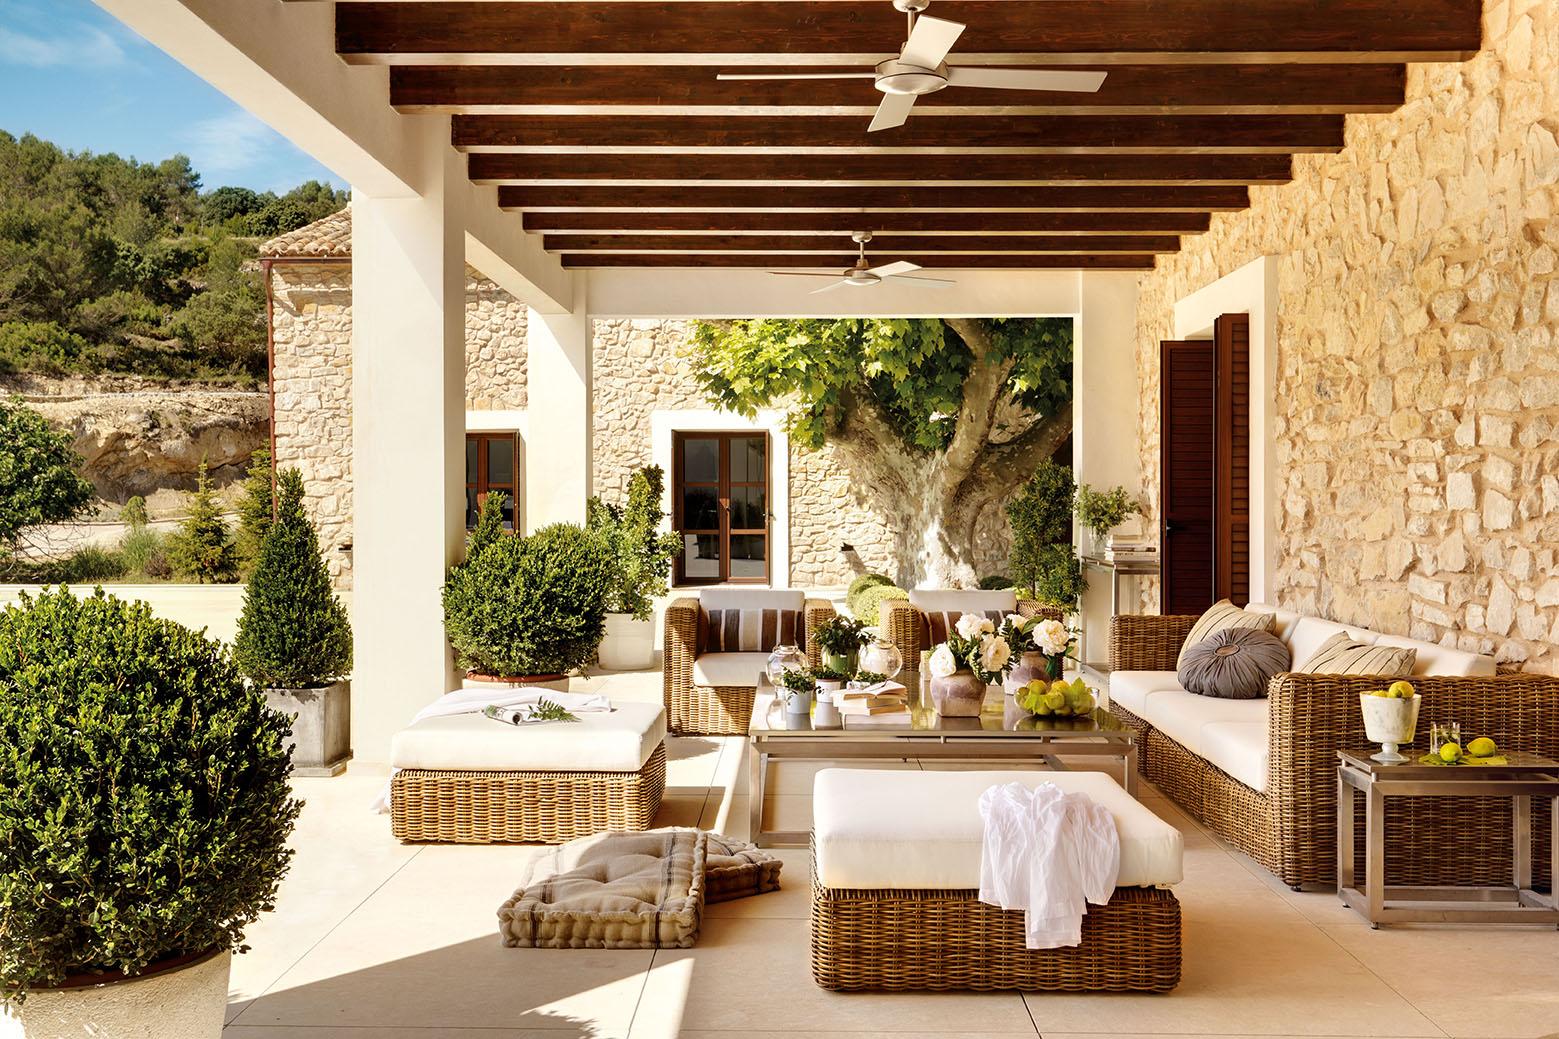 Fotos de una casa r stica por fuera y urbana por dentro for Sofas para porches